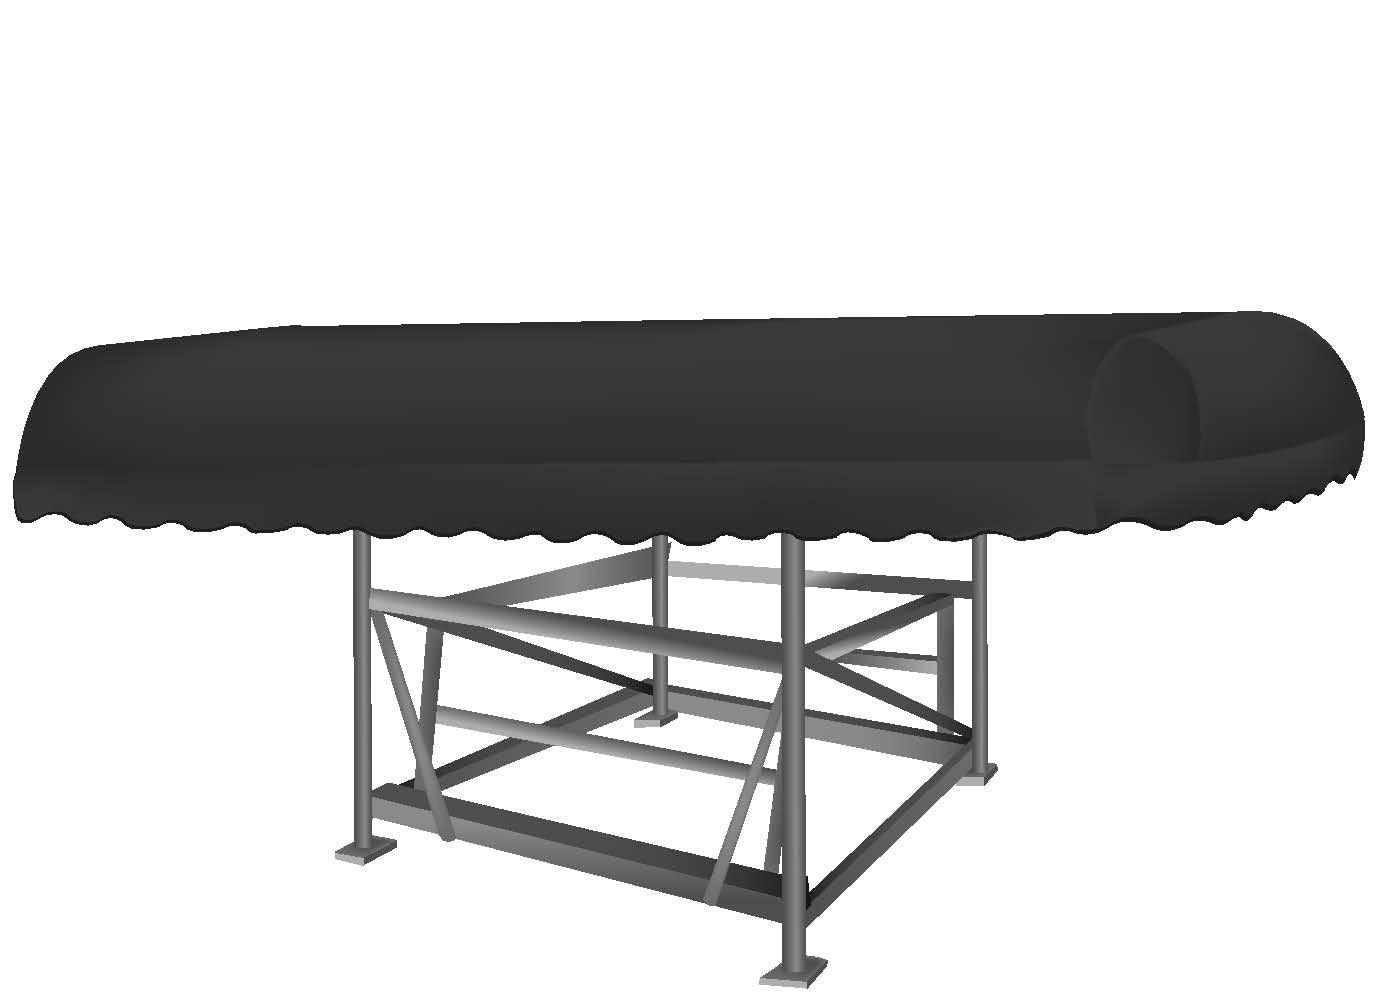 ShoreMaster Boat Lift Canopy Cover in Black  sc 1 st  CoverQuest & Shoremaster Boat Lift Canopy Cover | Shoretex Covers | CoverQuest